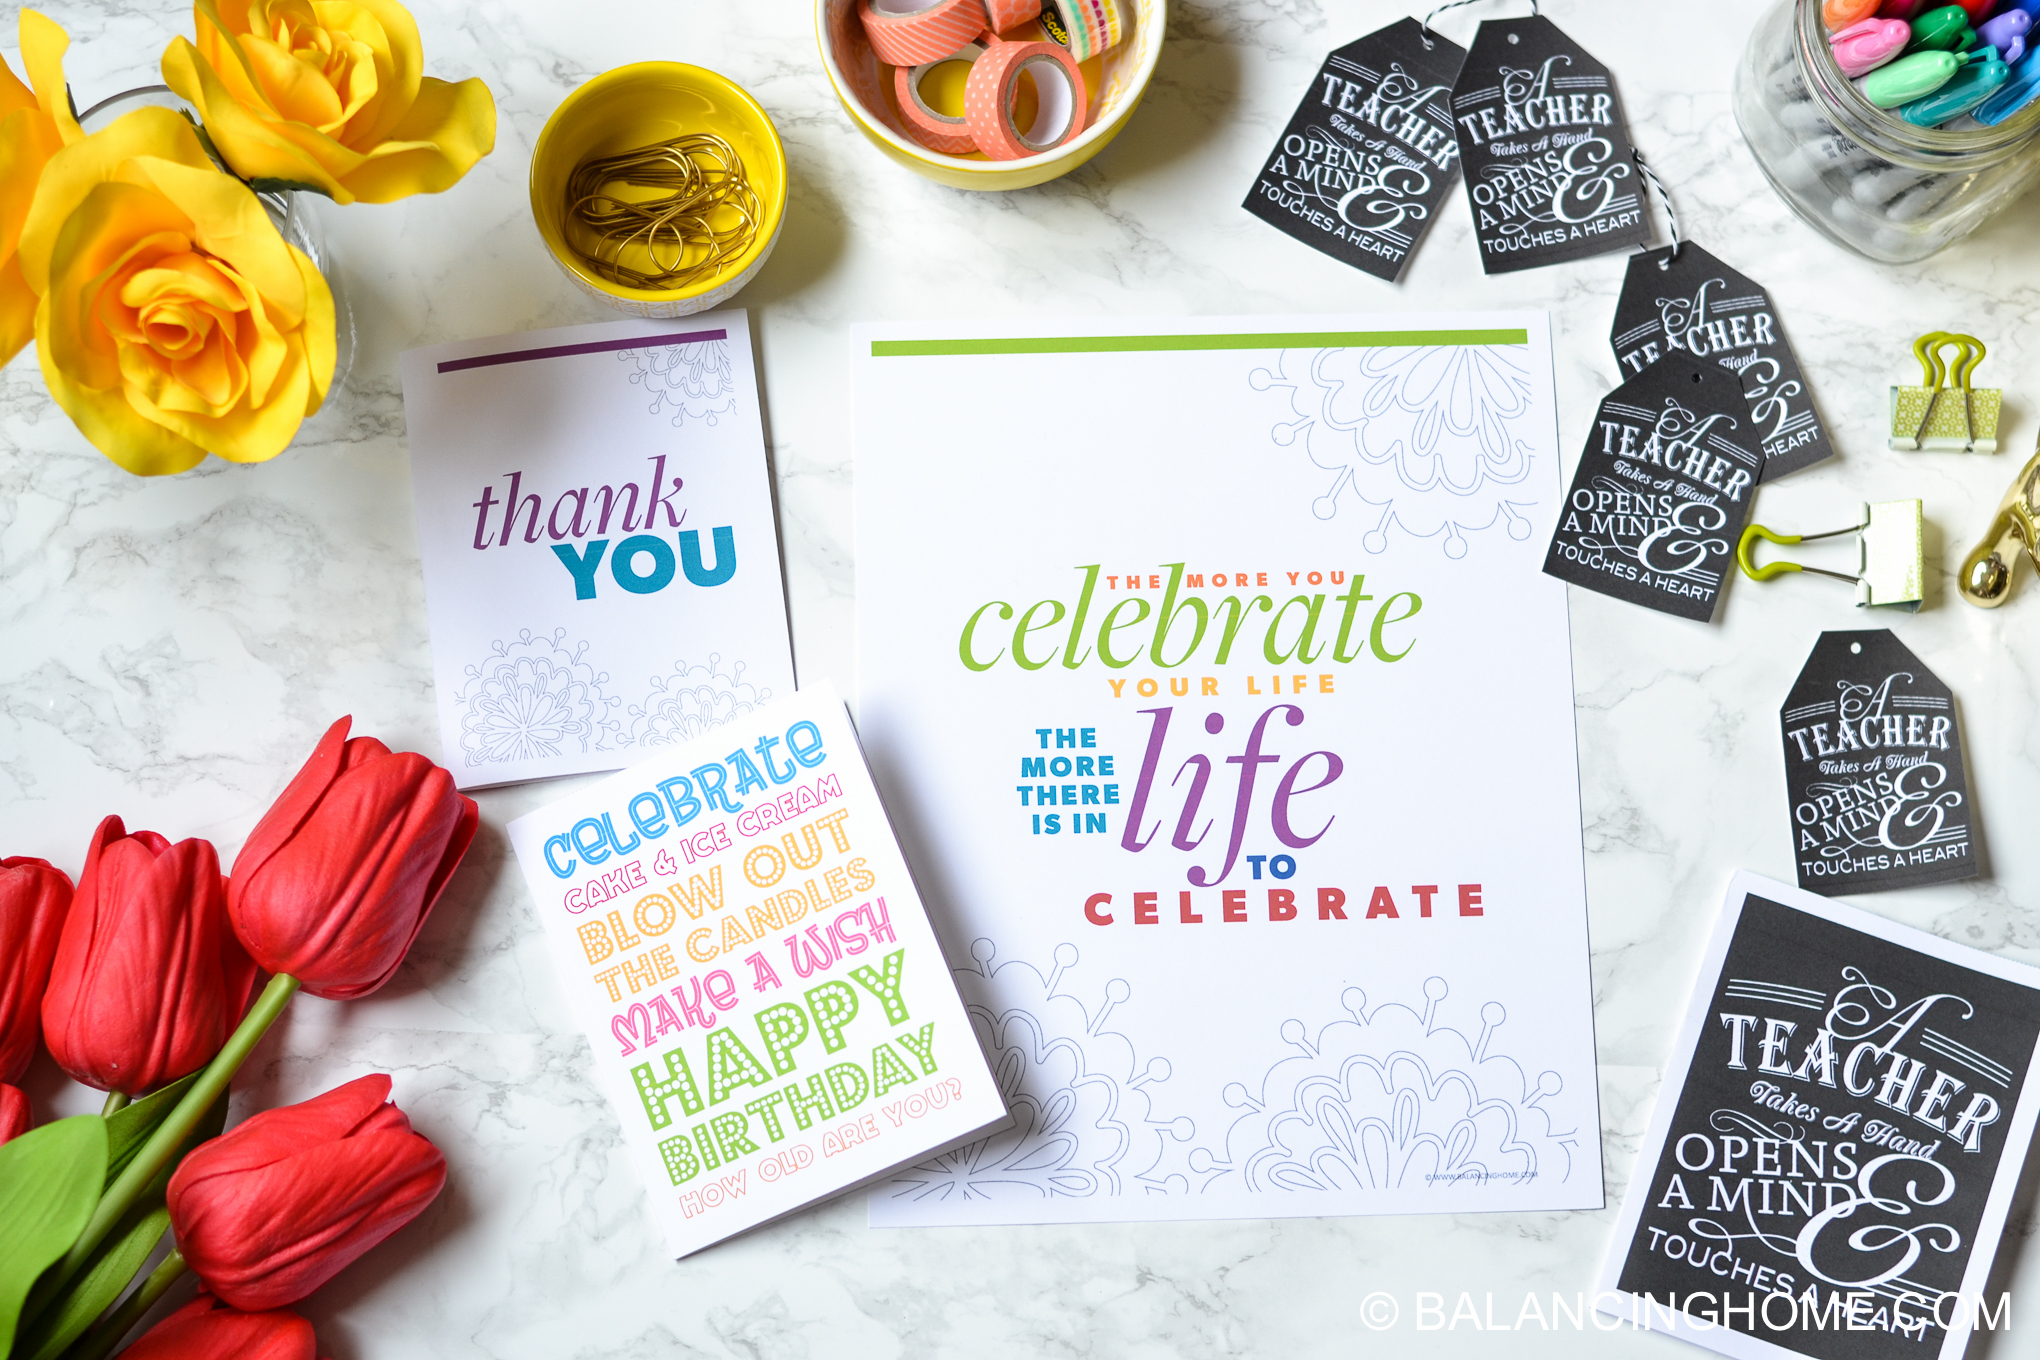 organizing planning printable template - printable thank you card, printable birthday card, printable teacher card, printable gift tags